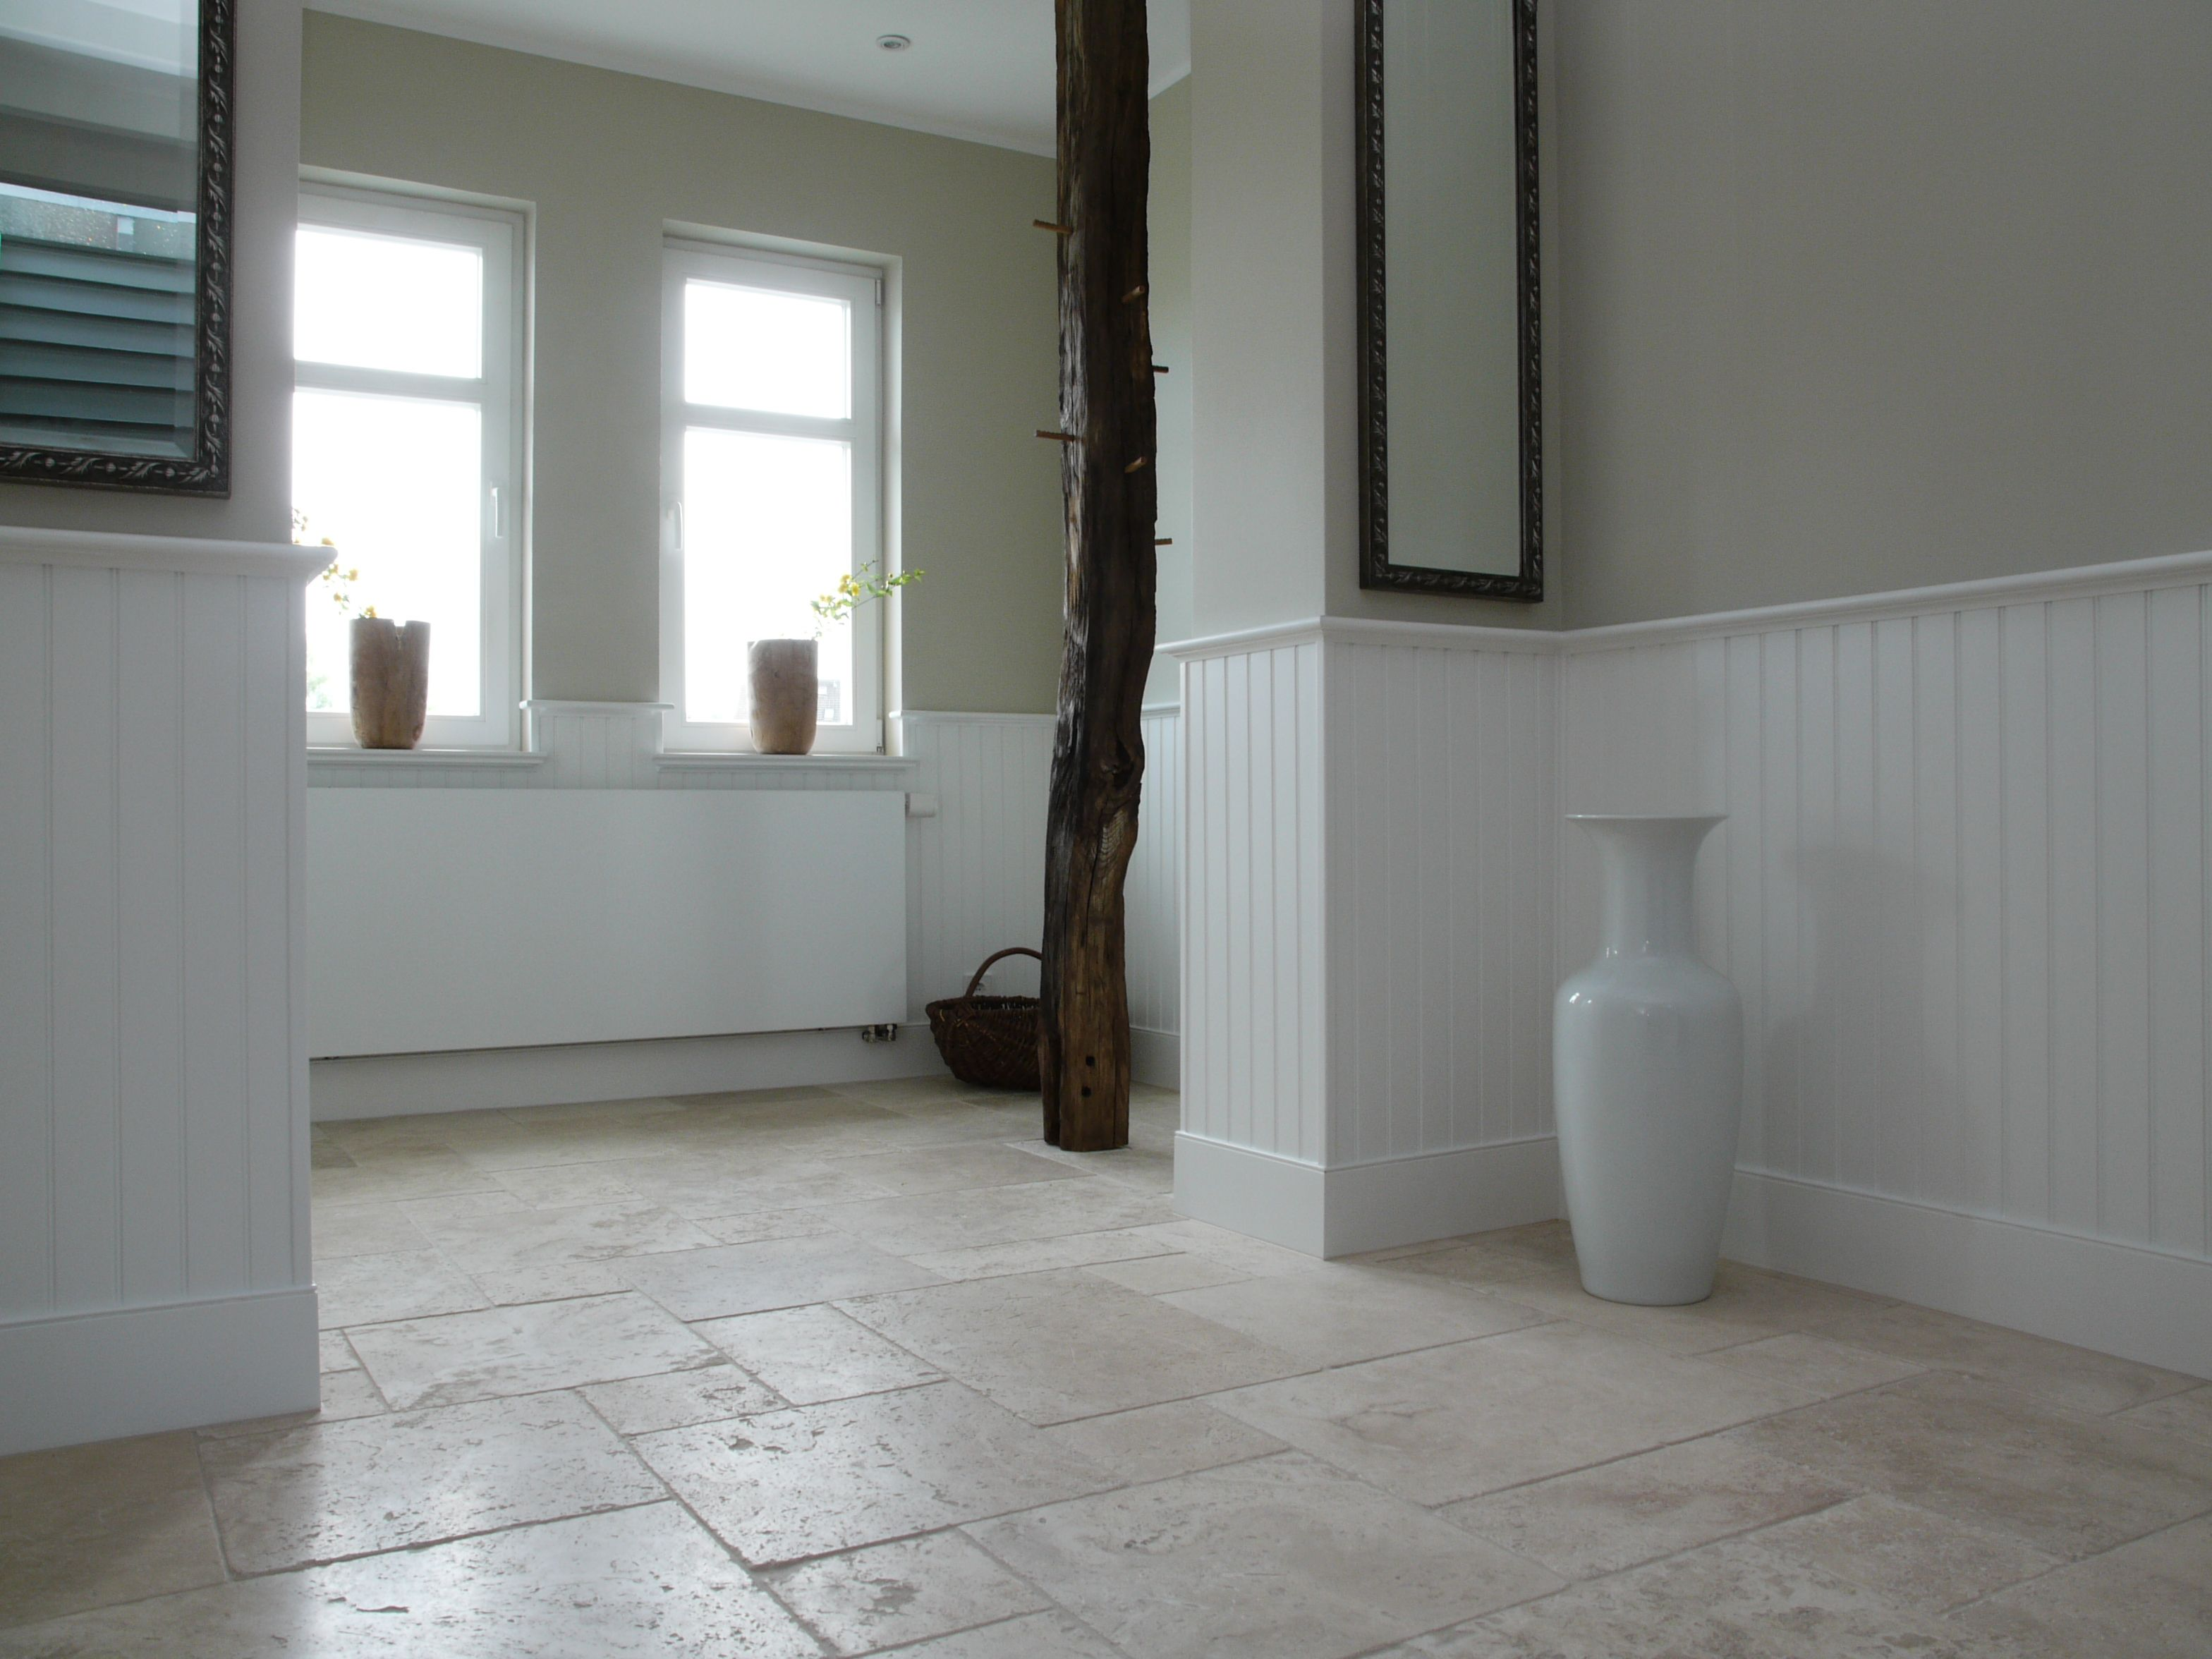 Turbo Wandpaneele Schwedenhaus minimalist minimalism | ديكور in 2019 LB39